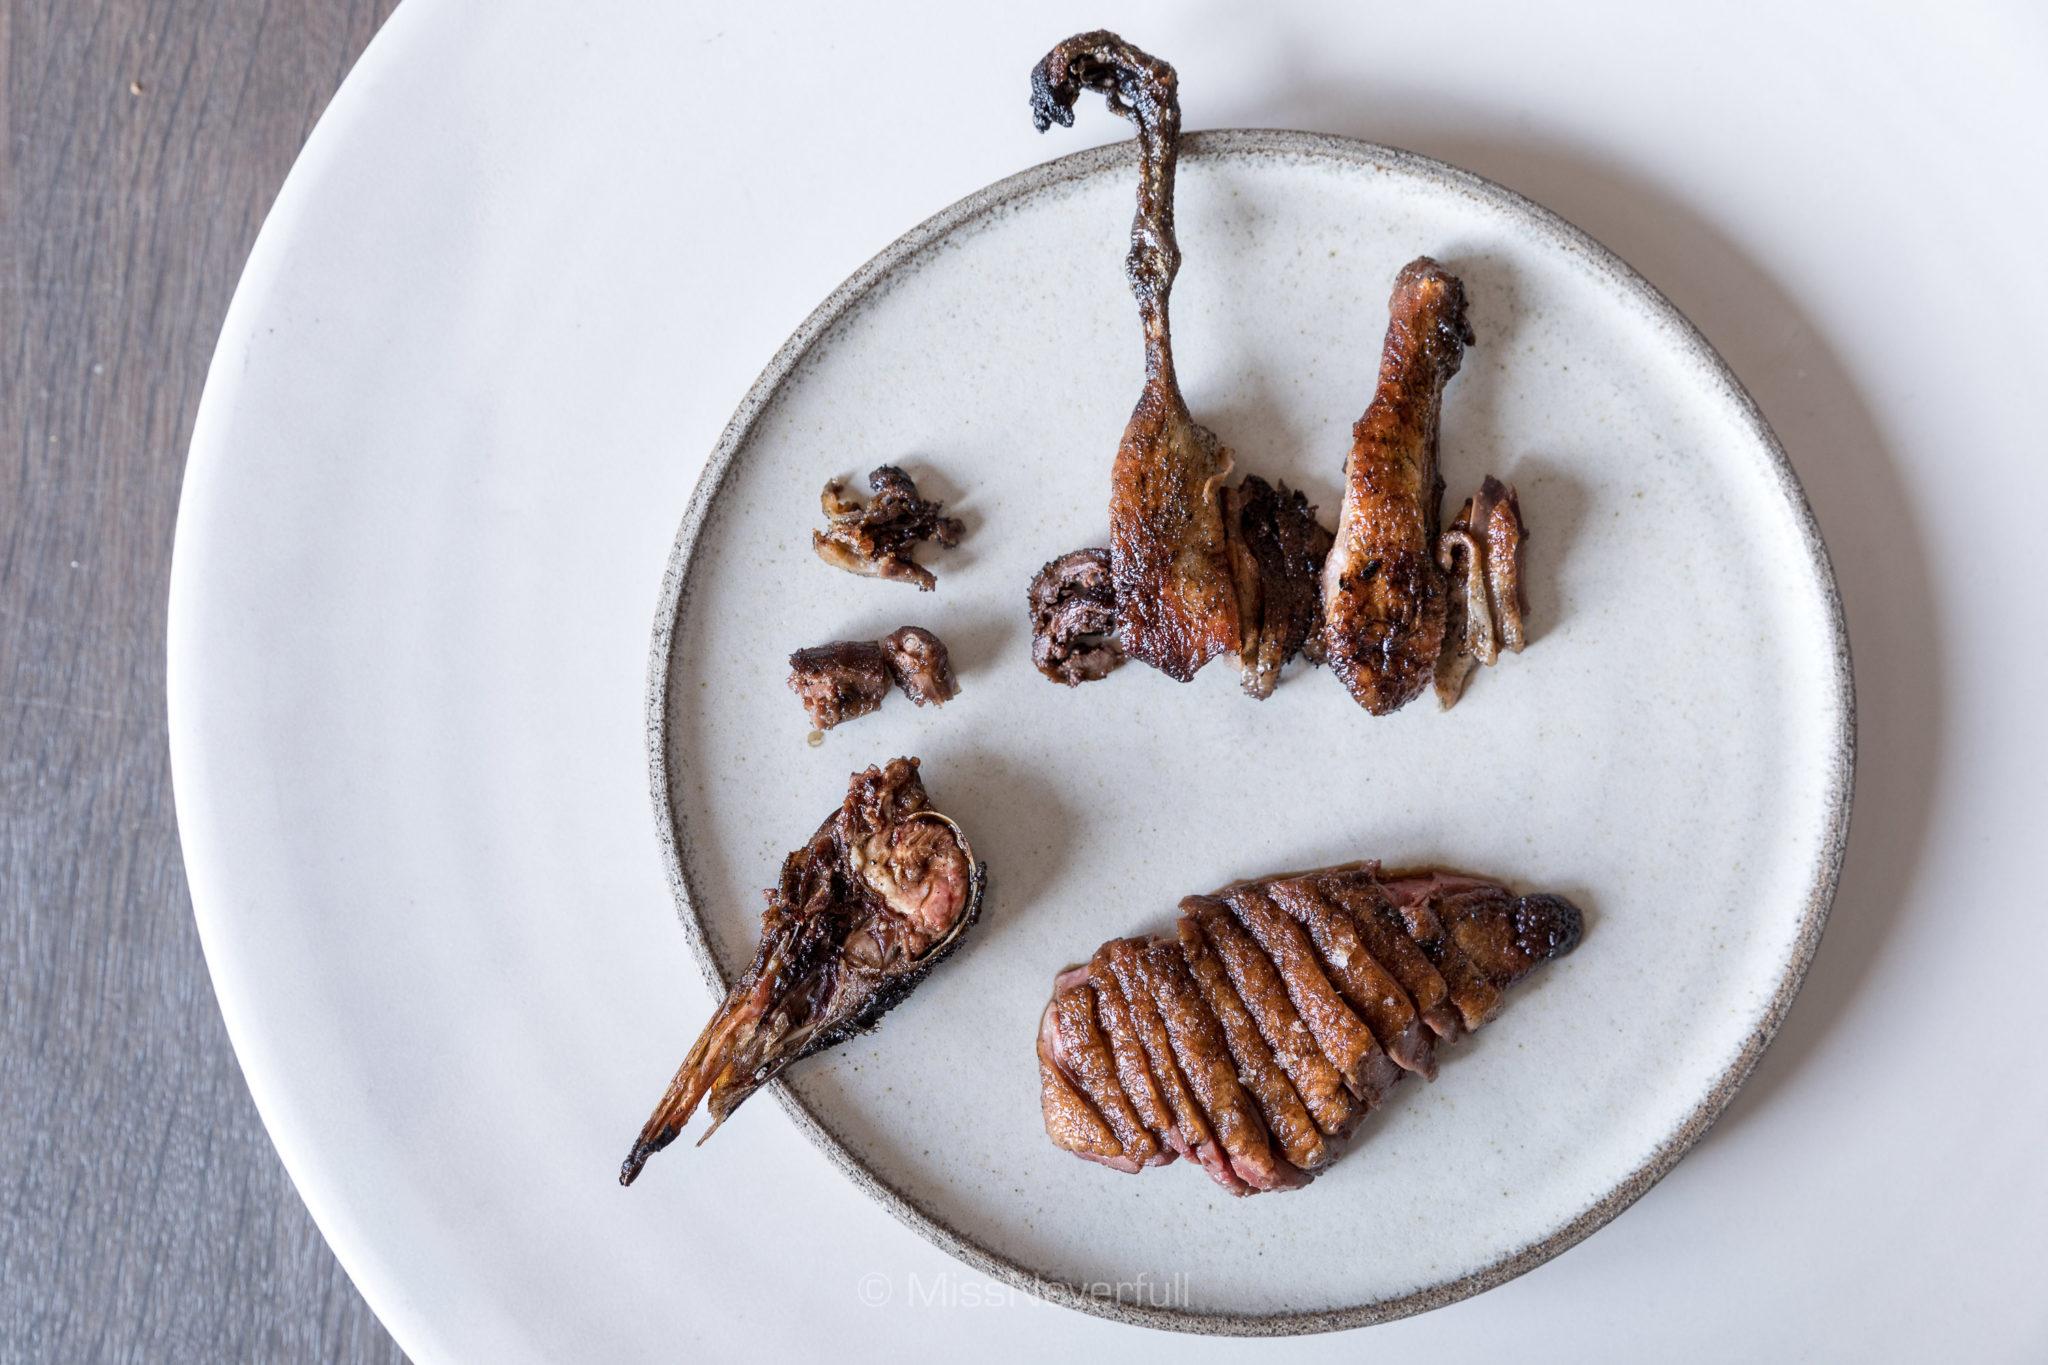 12. Whole roasted wild duck